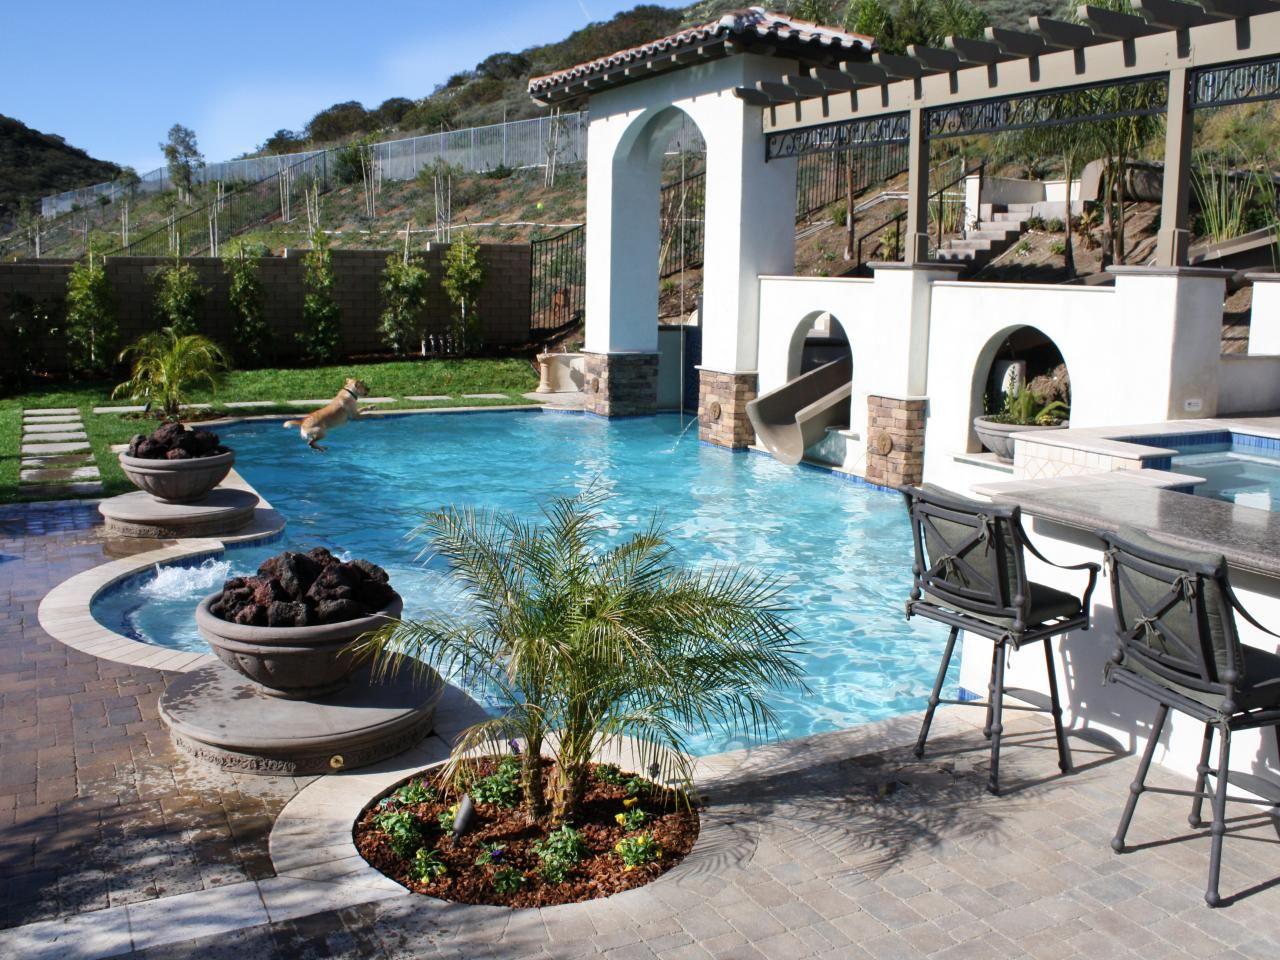 epic private backyard pools - HD1280×960